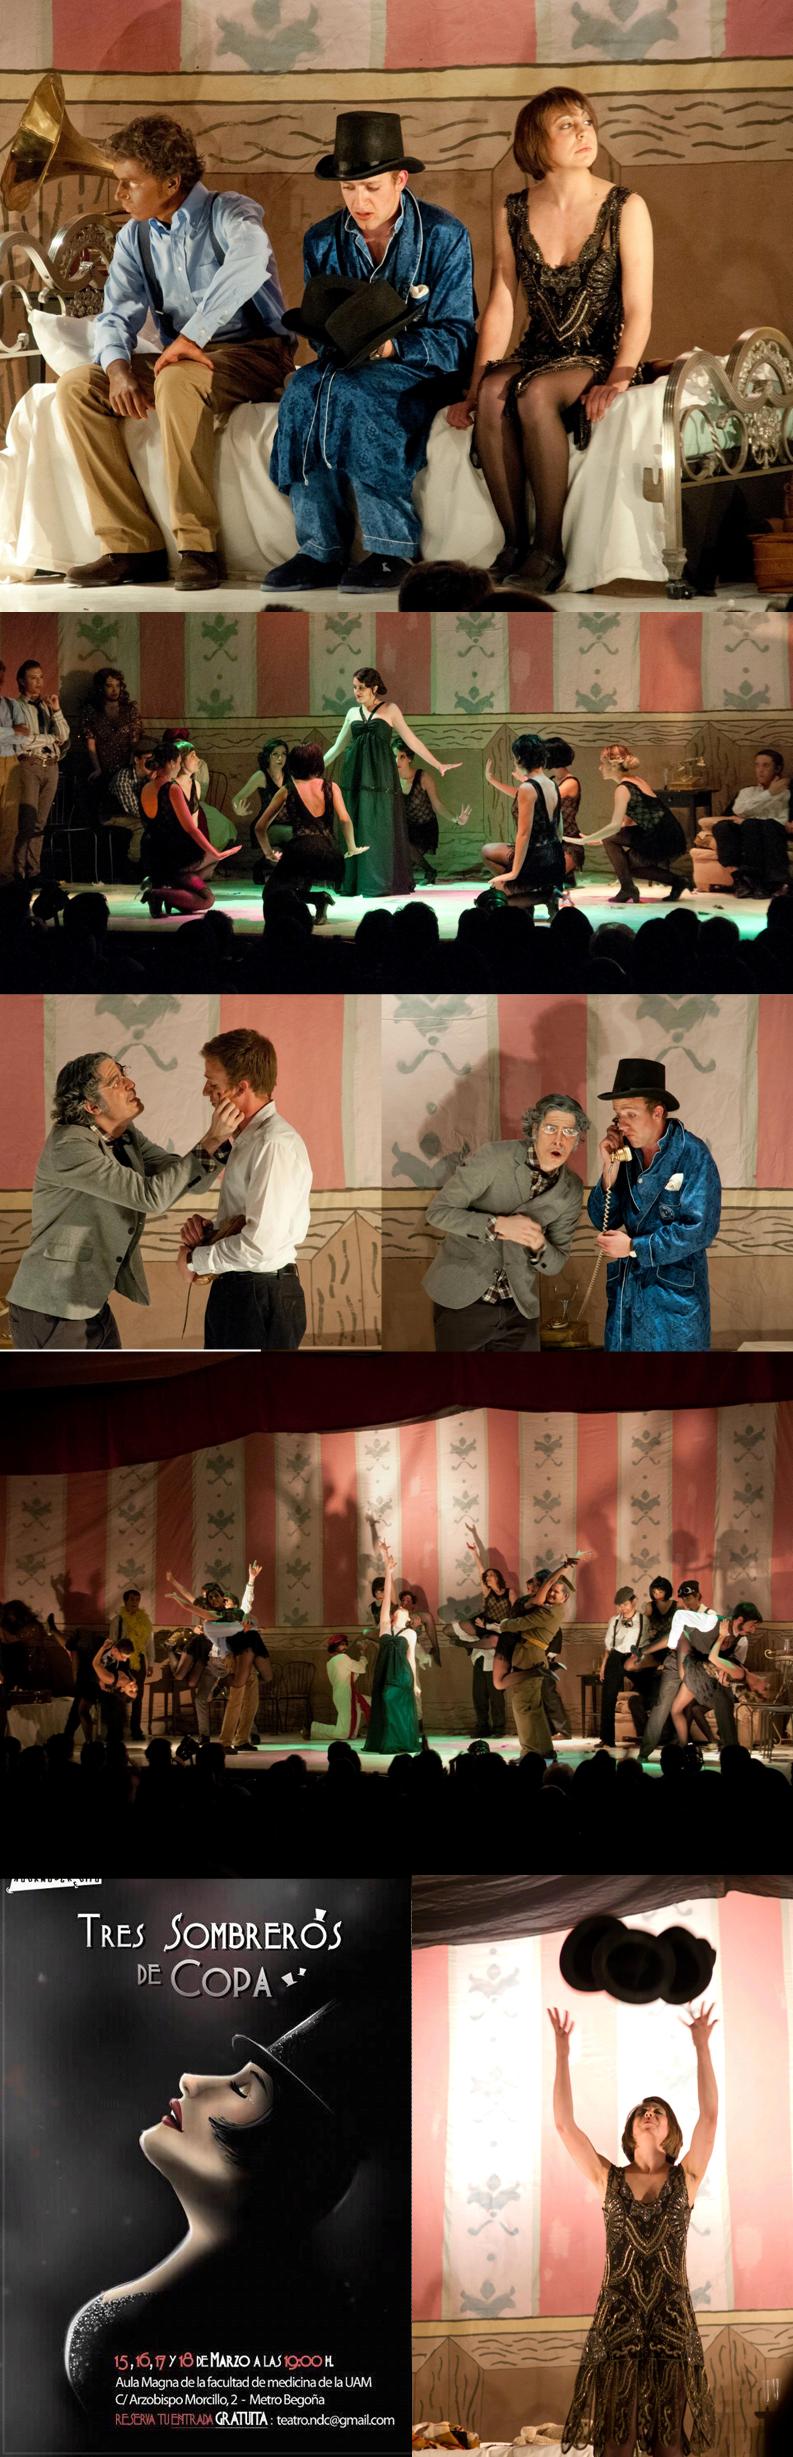 3-sombreros-de-copa-nodamoscredito-NDC-teatro-foto-obra_002